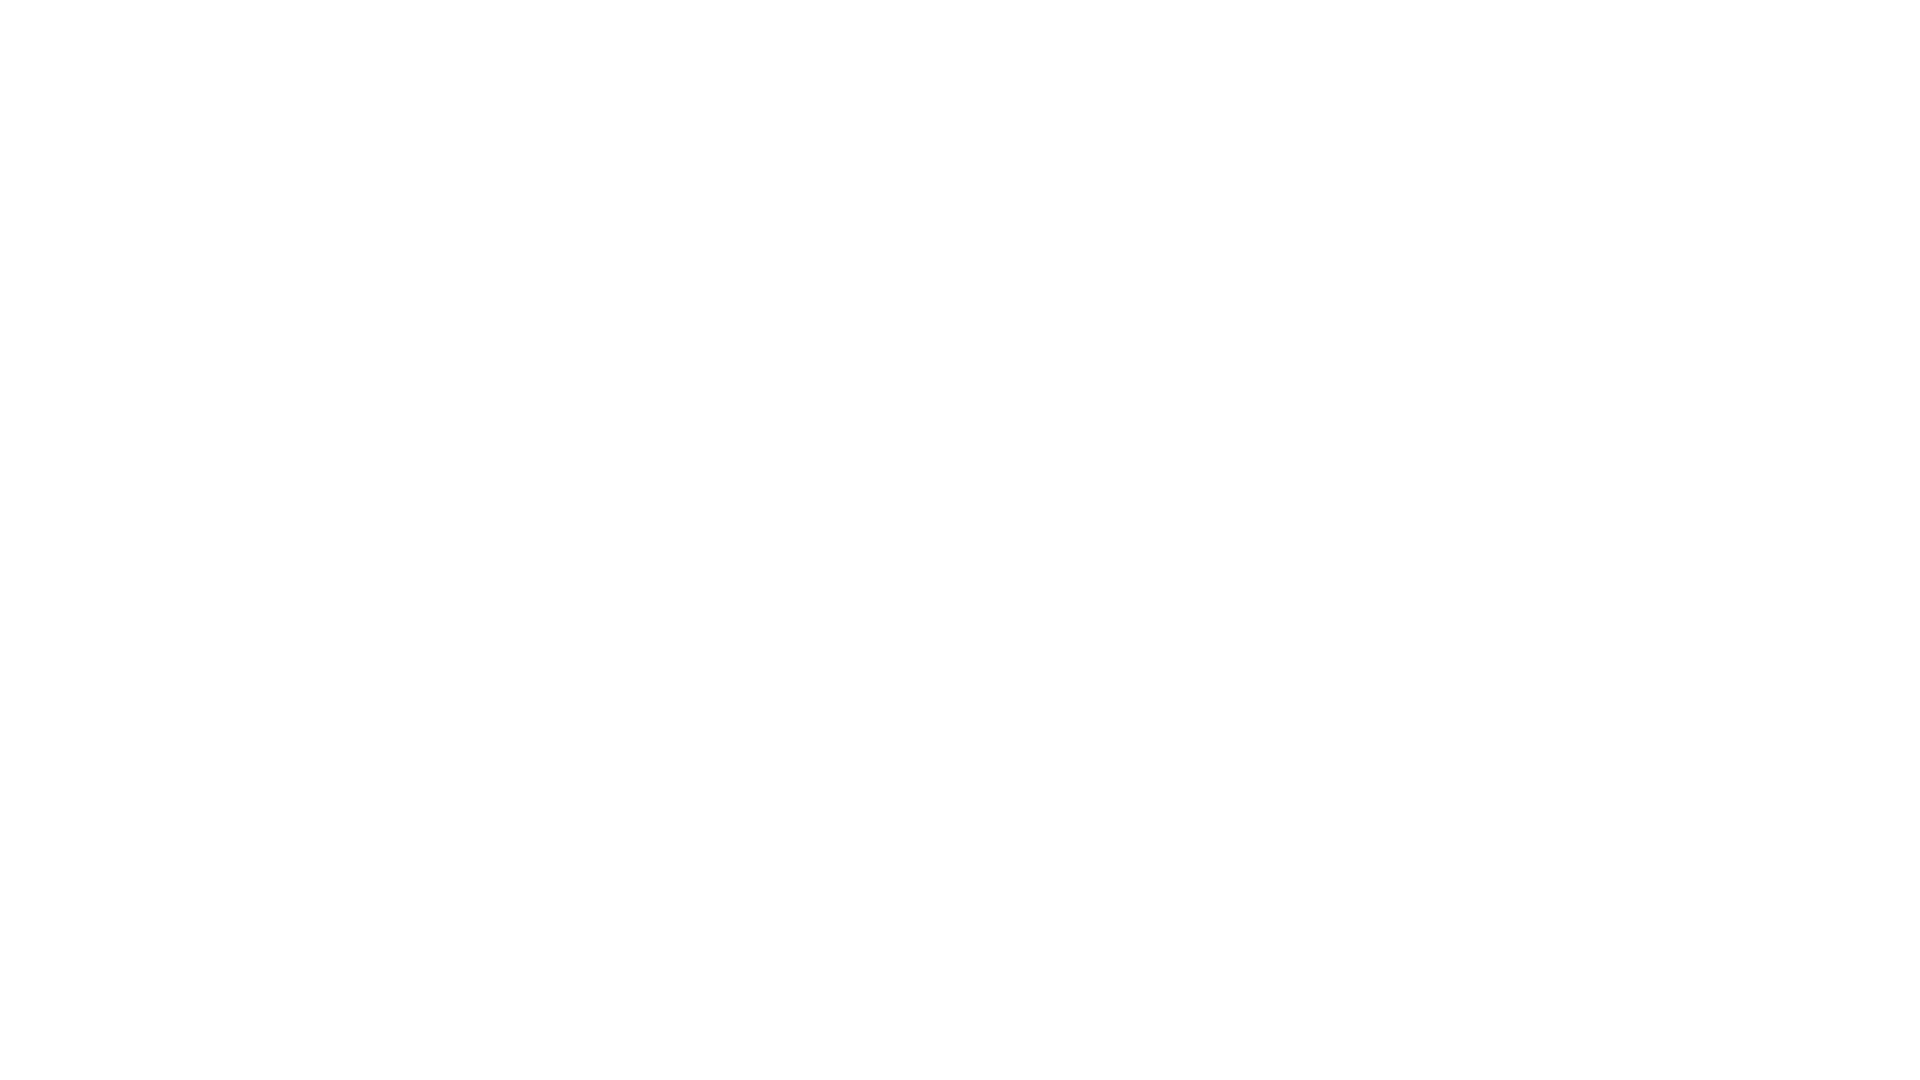 blank1920